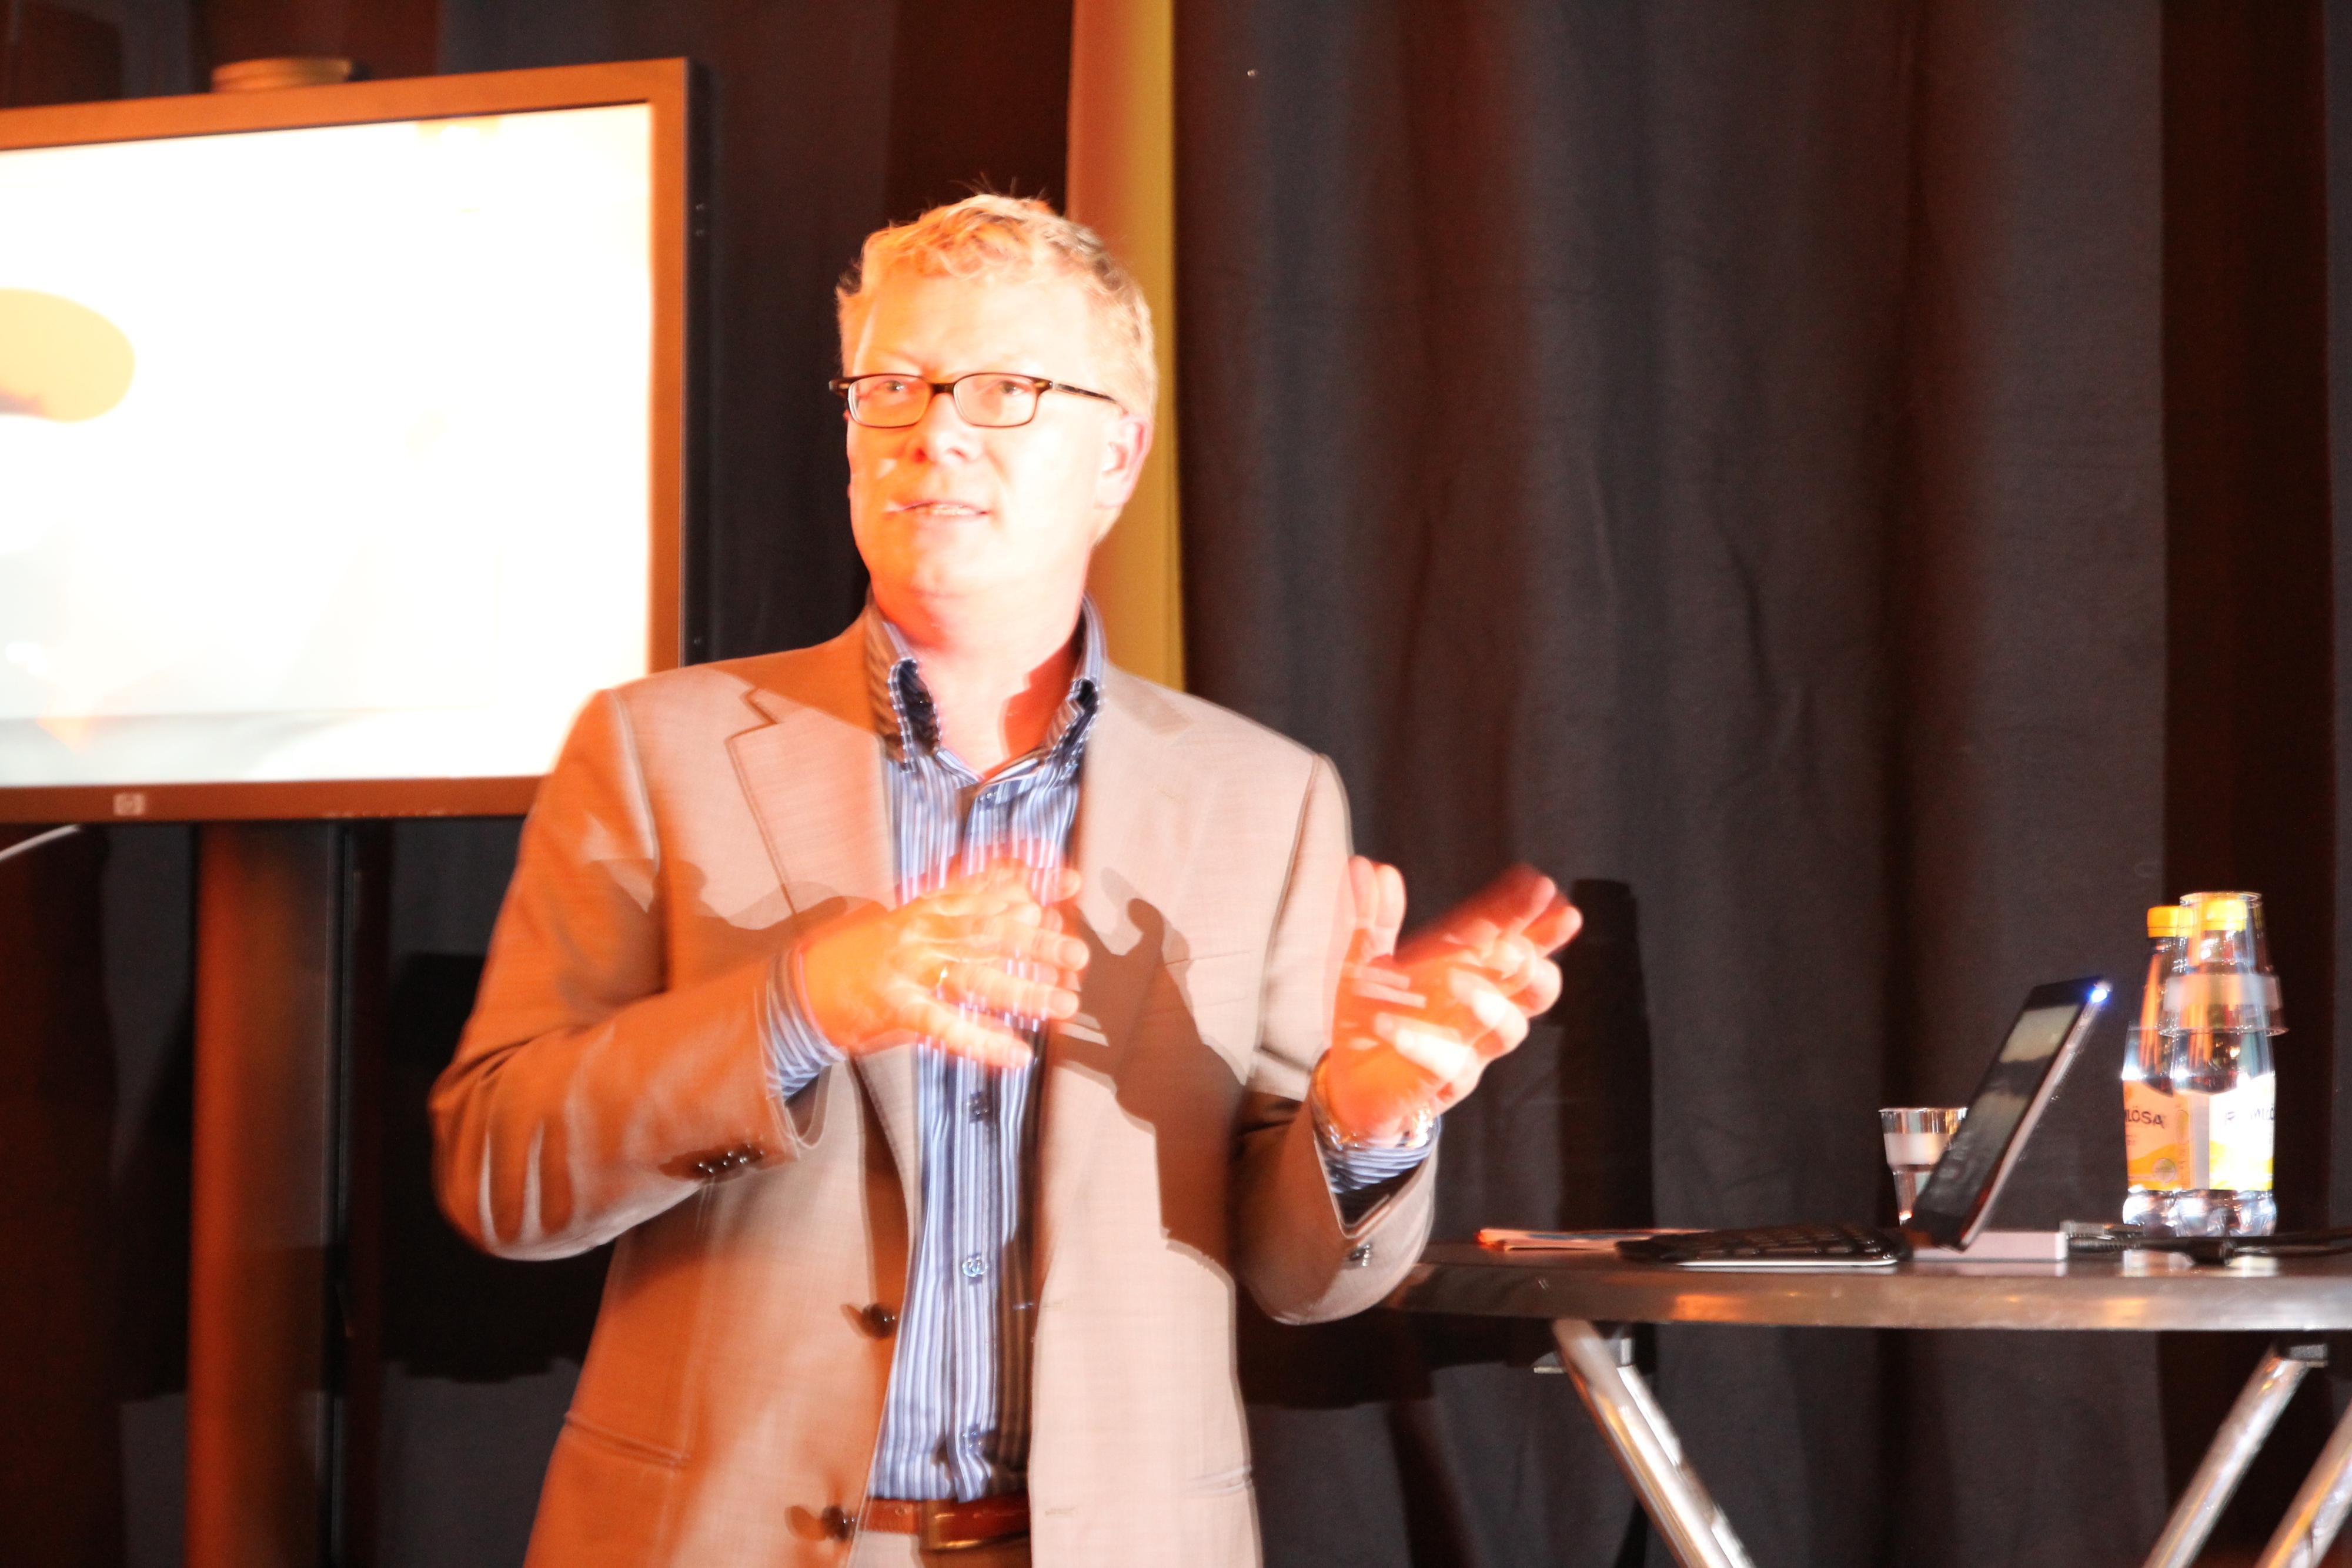 Produktsjef for Windows 8, Christian Almskog viste stolt frem Microsofts nyeste operativsystem.Foto: Niklas Plikk, Hardware.no